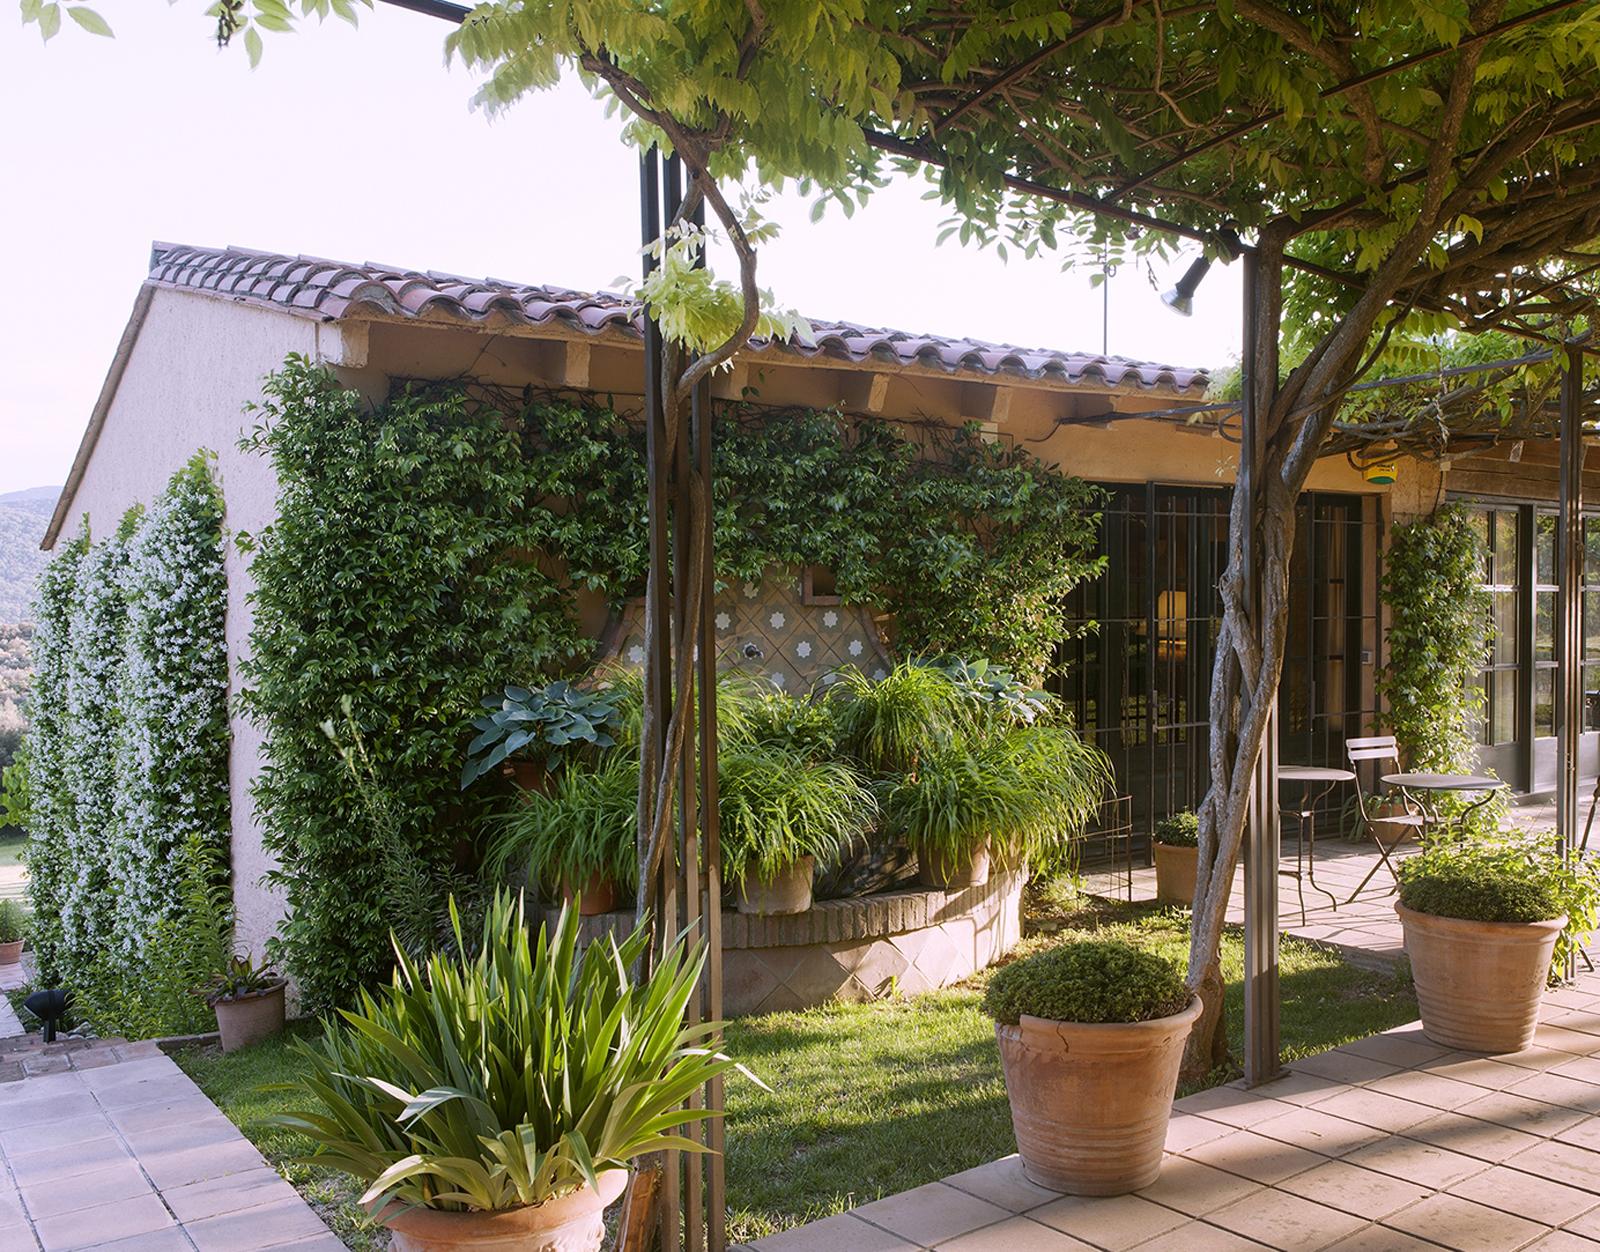 suiteamarilla#marourevell#relax.JPG